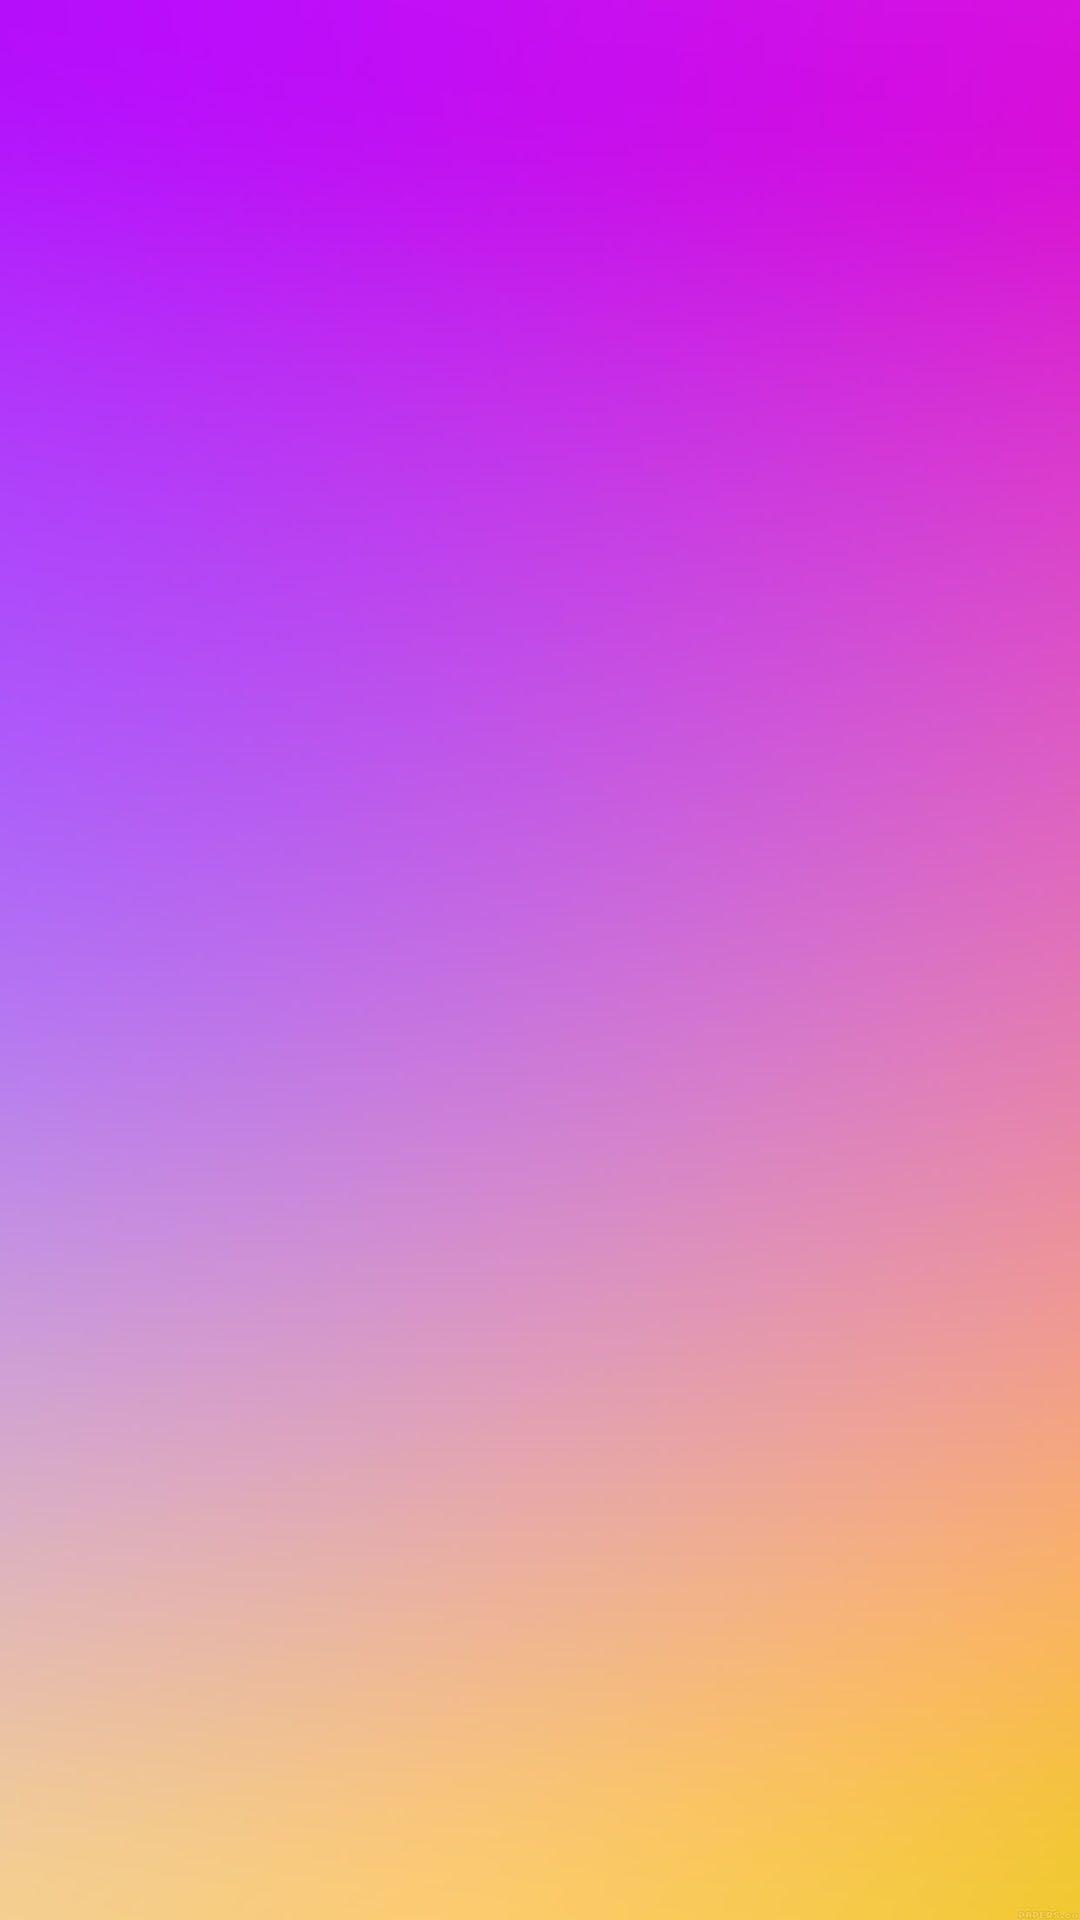 American Dream Gradation Blur Background Iphone 6 Wallpaper Behr Paint Colors Solid Color Backgrounds Behr Paint